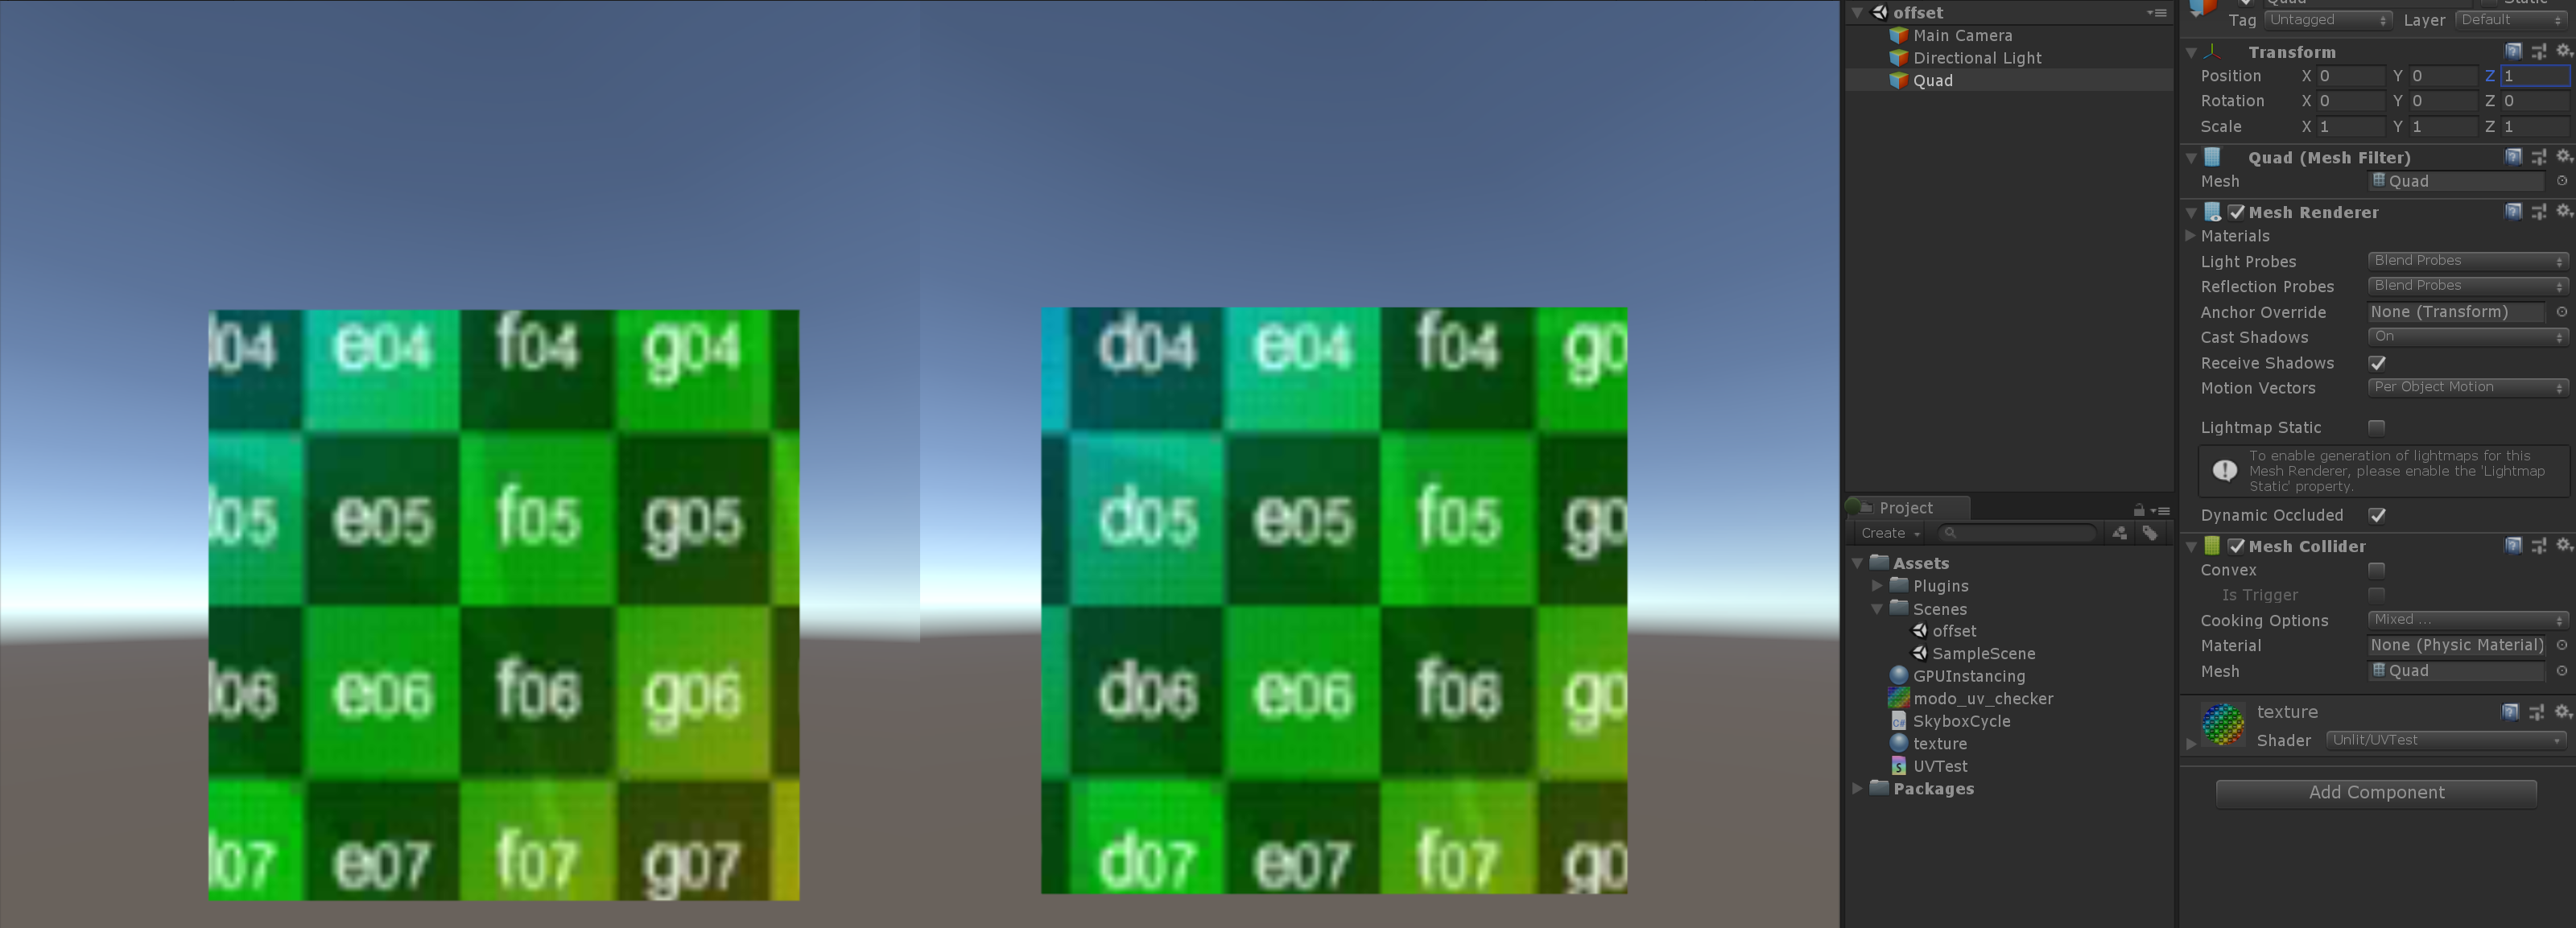 The result of ComputeScreenPos is different between VR's lefteye